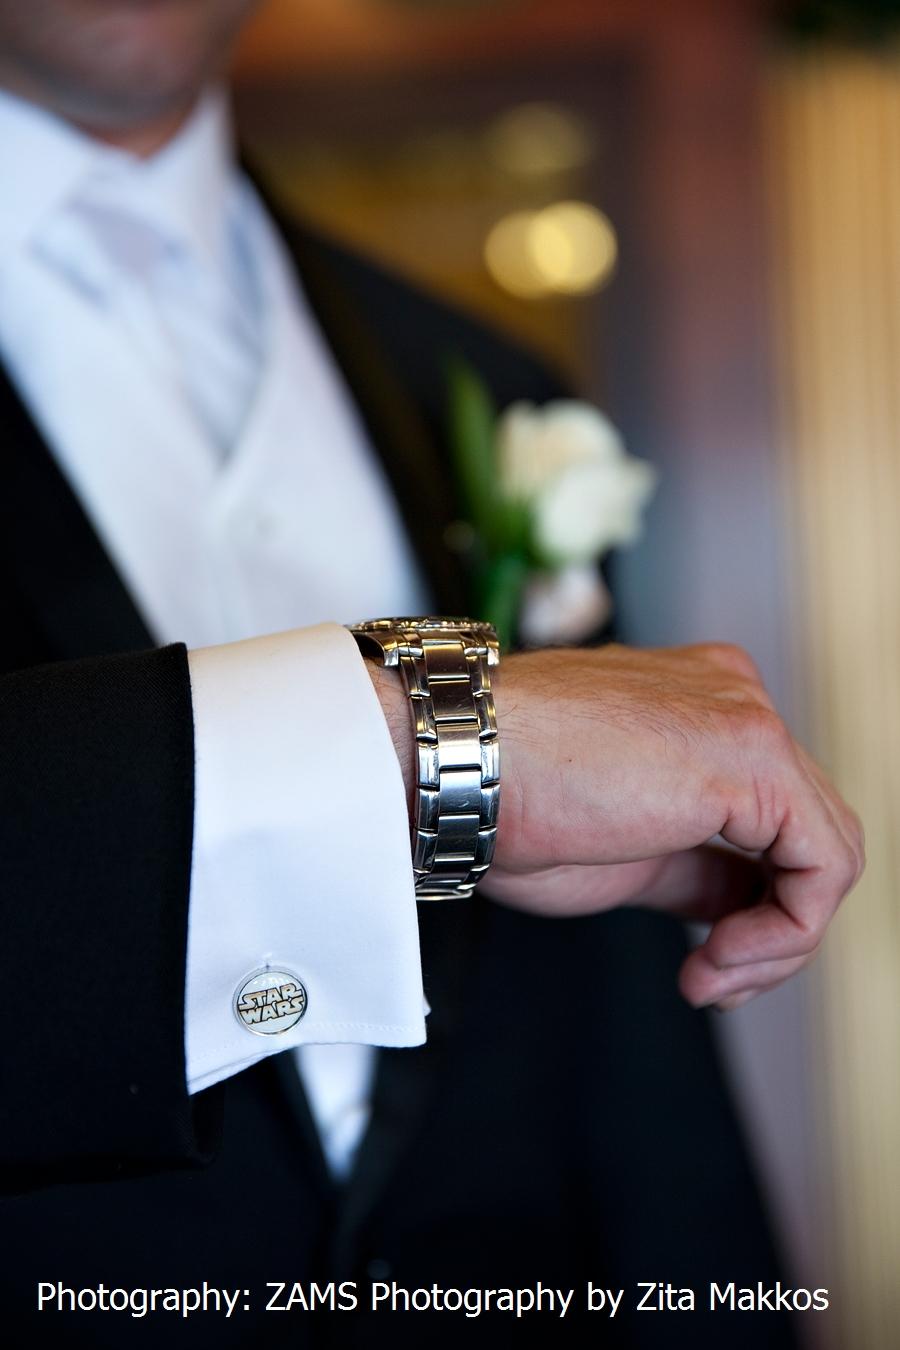 templar_cross_cuff_links_men_wedding_groomsmen_grooms_cufflinks_2.jpg